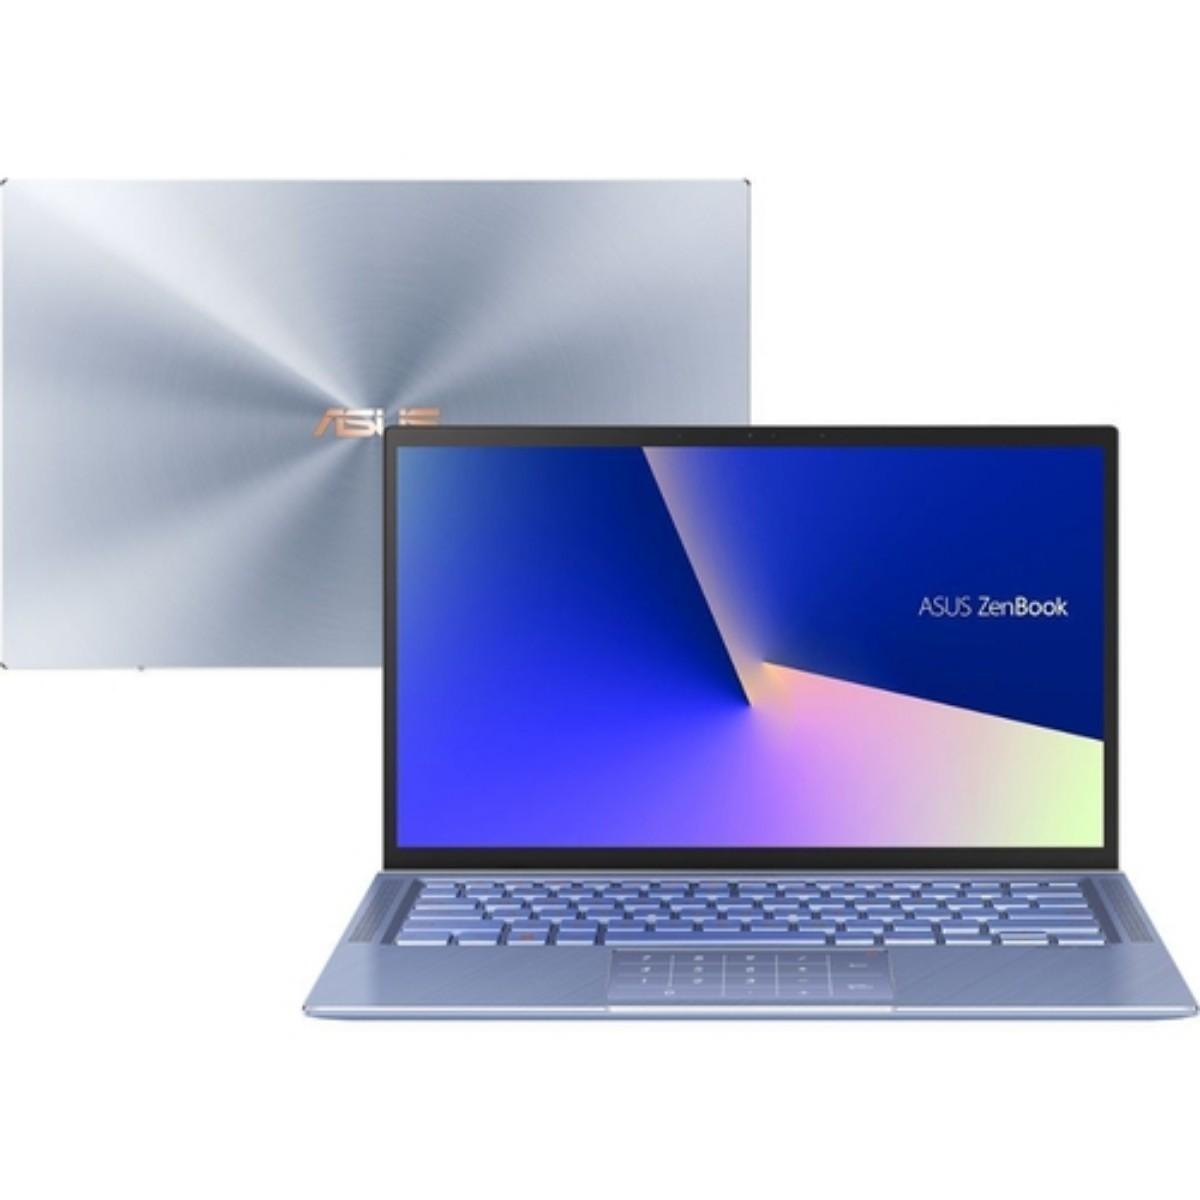 Imagem do notebook modelo Asus Zenbook 14